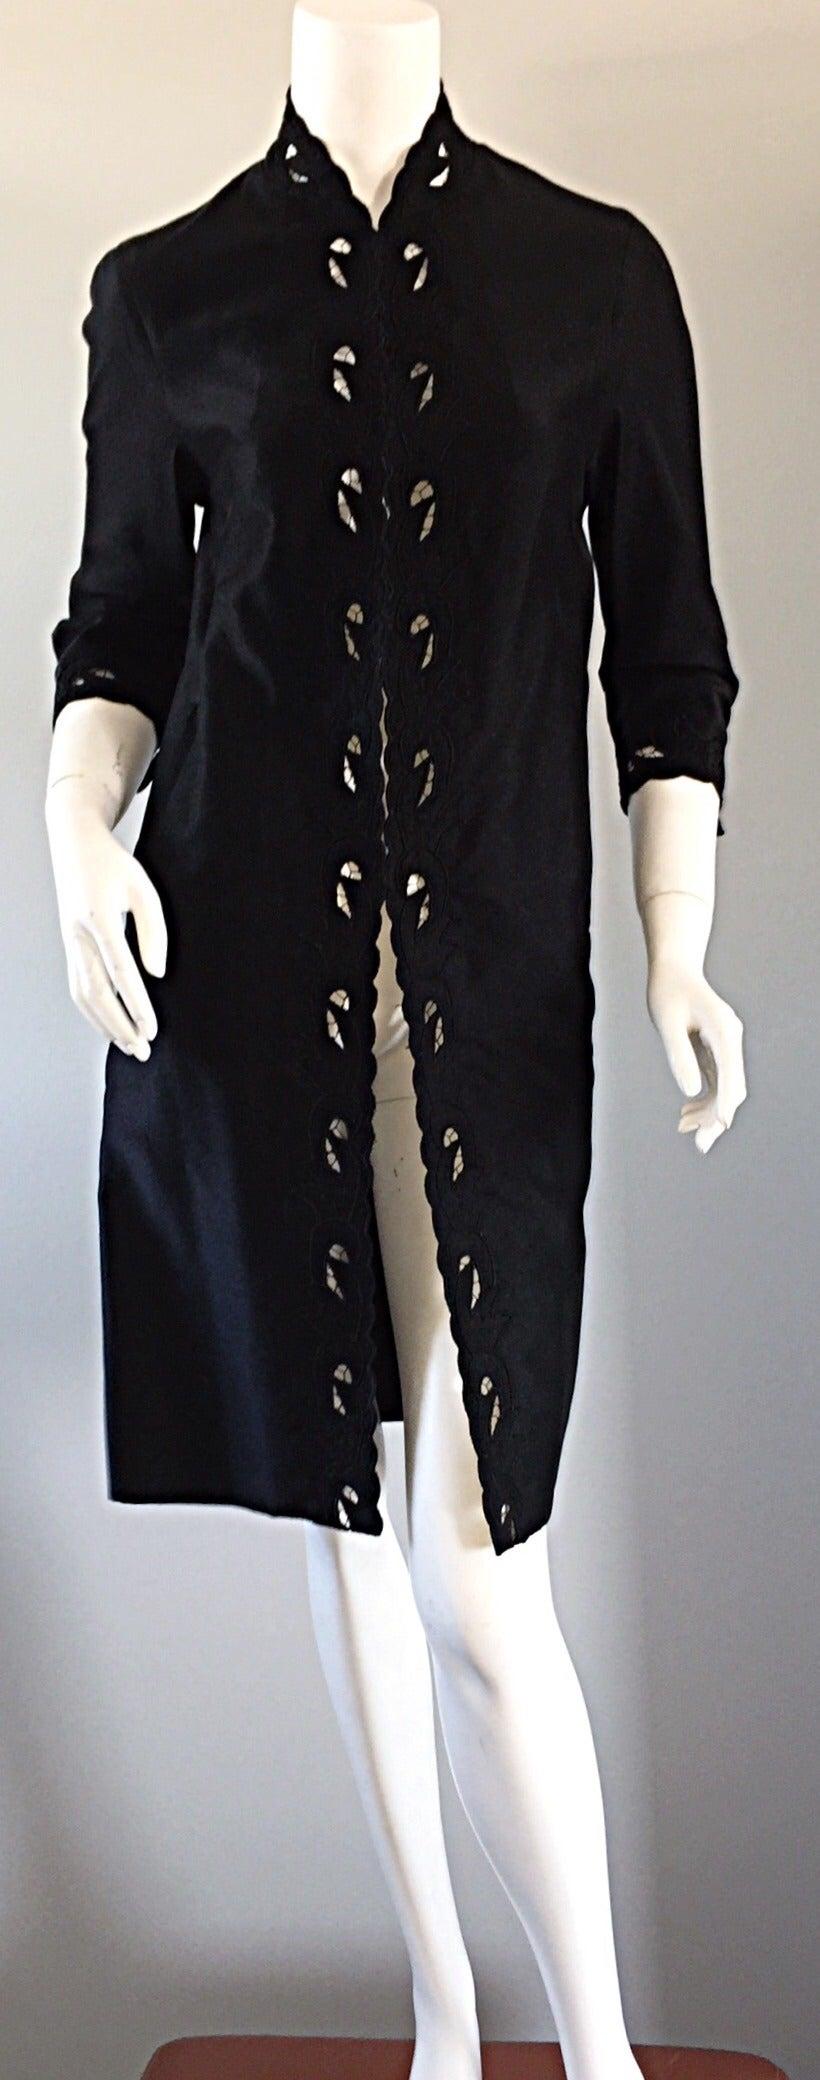 Chic 1940s Black Duster / Opera Jacket w/ Crochet Details + Scalloped Edges 9